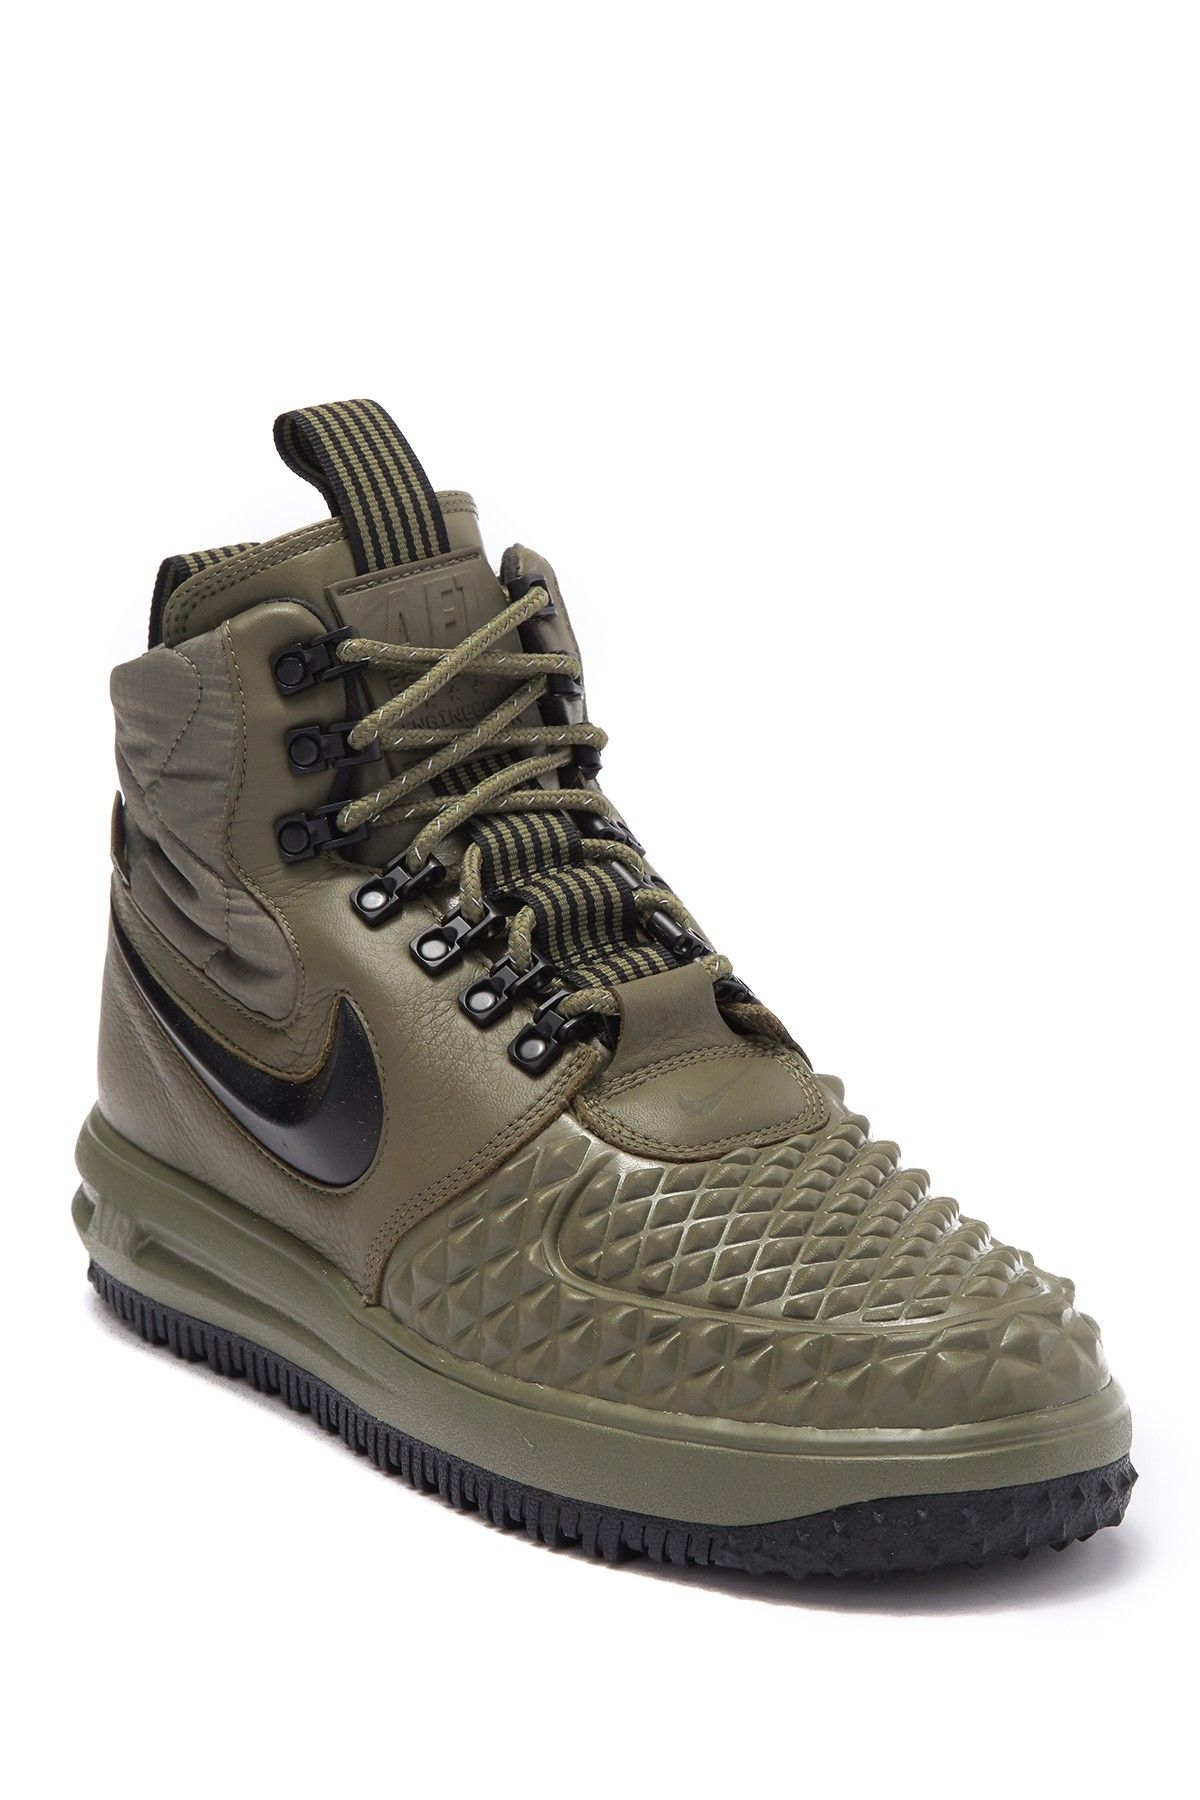 Lf1 Duckboot 17 Sneaker In Medium Olive